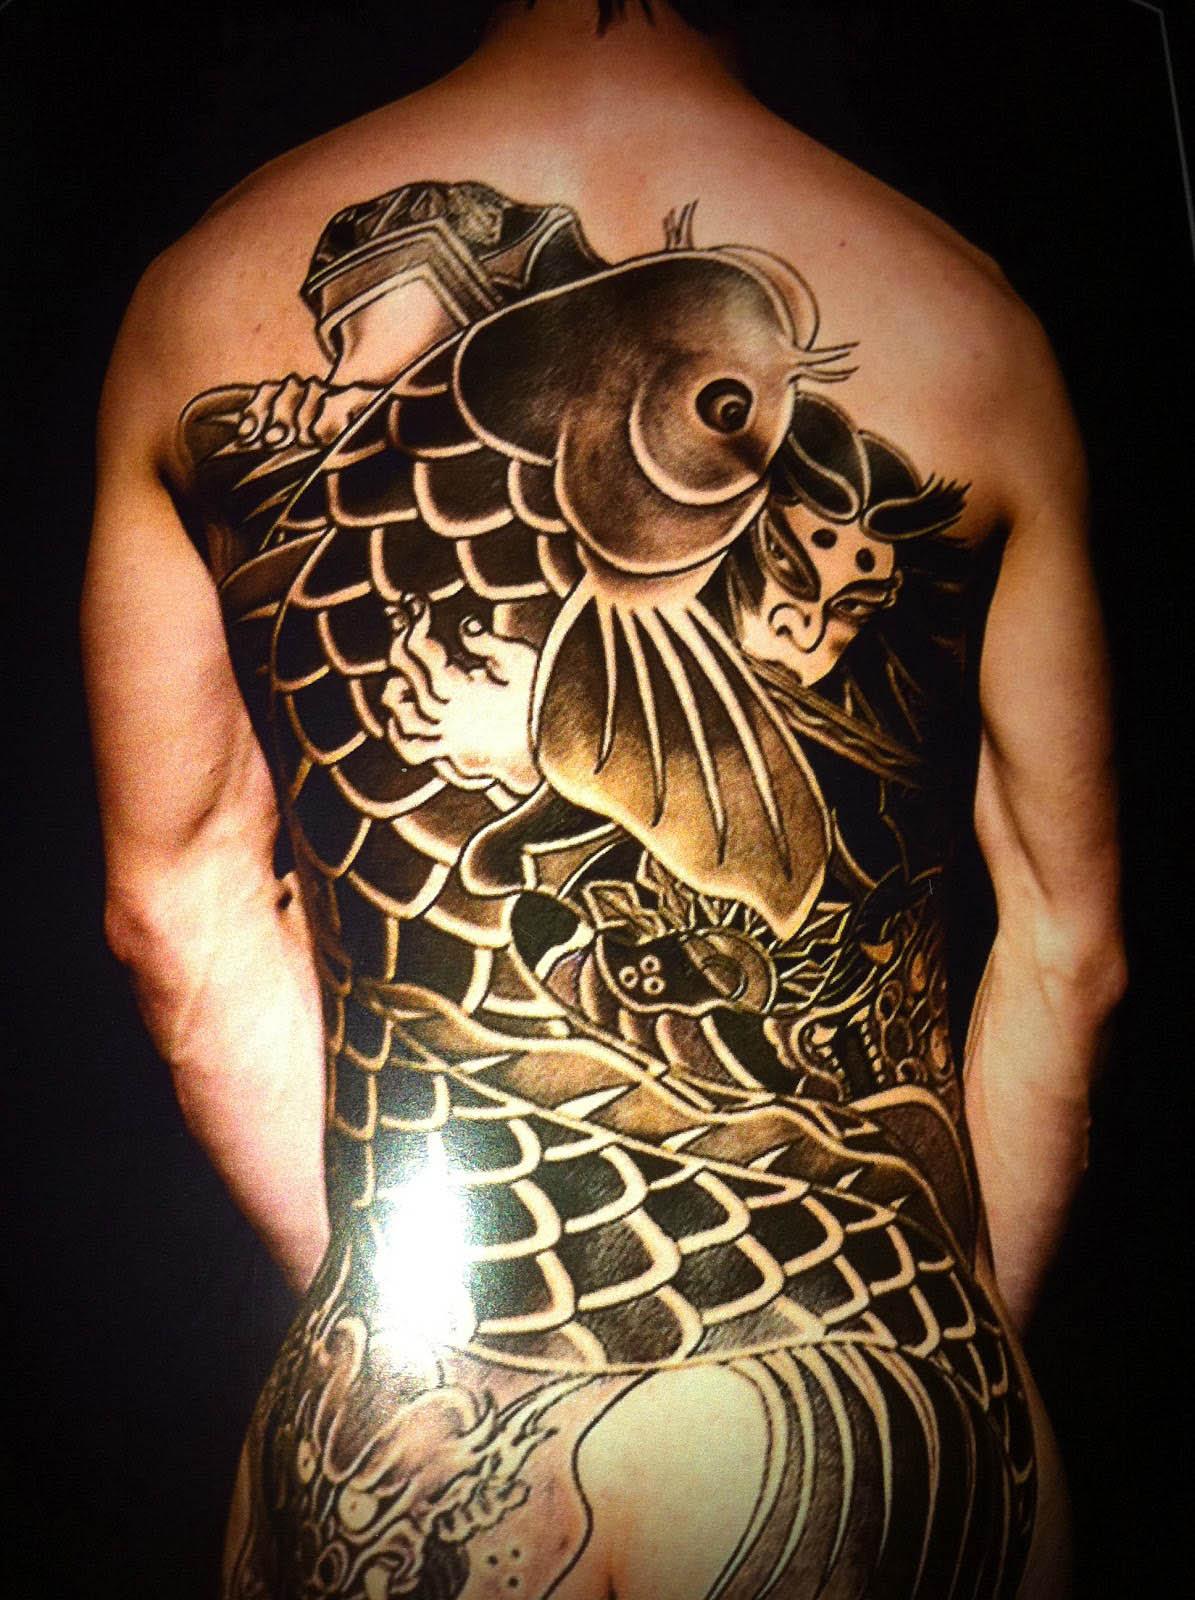 Koi tattoos pics gallery full hd wall pictures for Koi tattoo pics